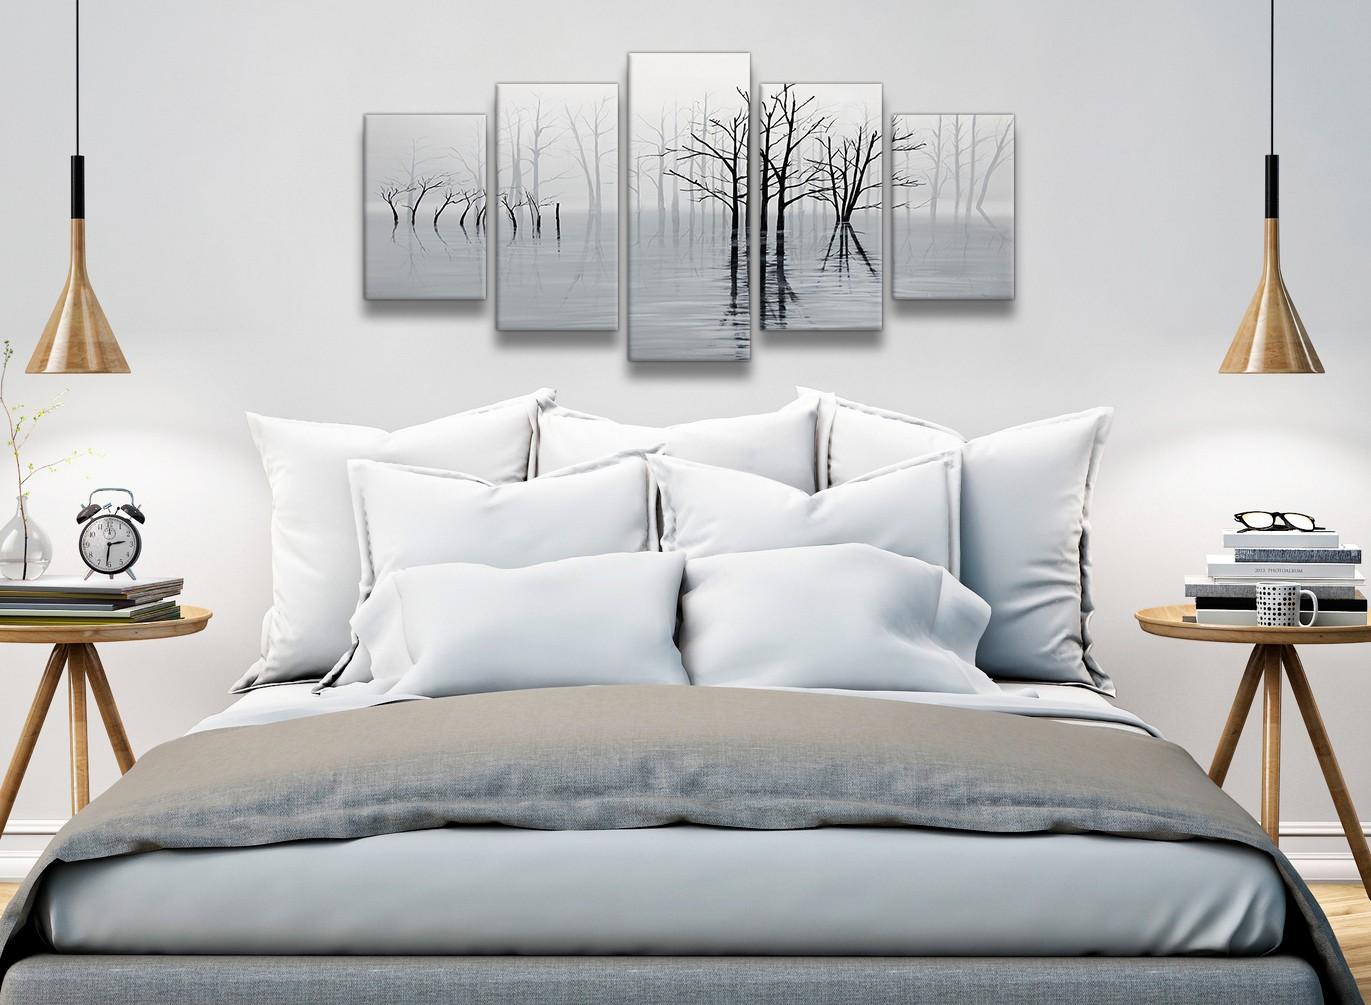 5 Piece Black White Grey Tree Landscape Painting Bedroom Canvas Wall Art Decor 5416 160cm Xl Set Artwork